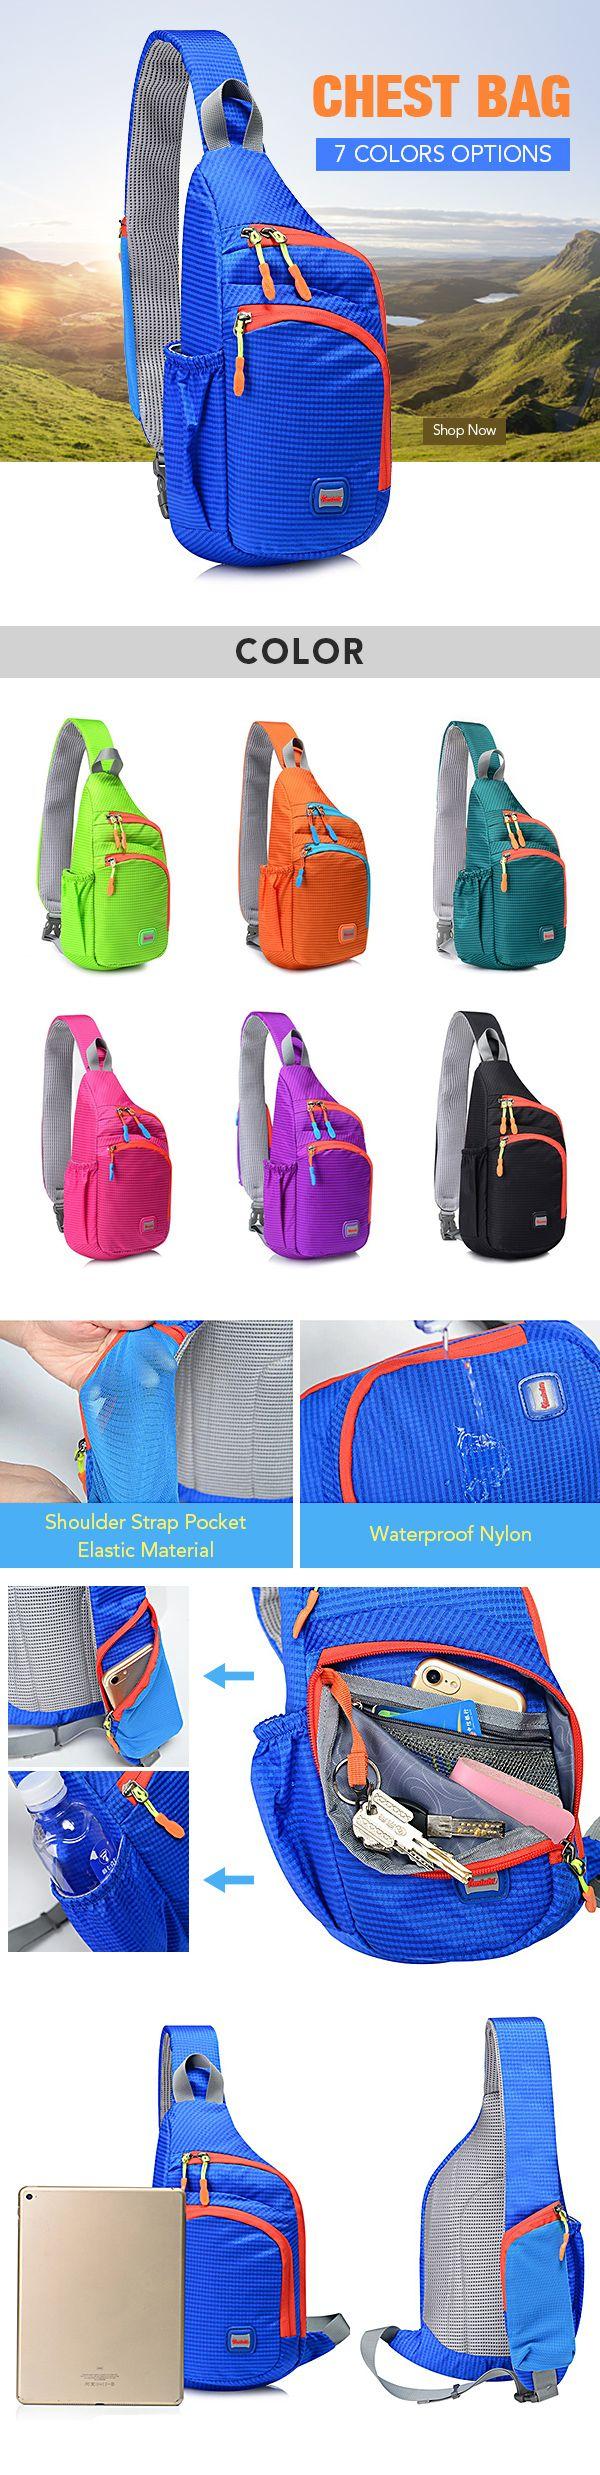 US$13.88  Casual Lightweight Waterproof Nylon Chest Bag Outdoor Sport Crossbody Bag